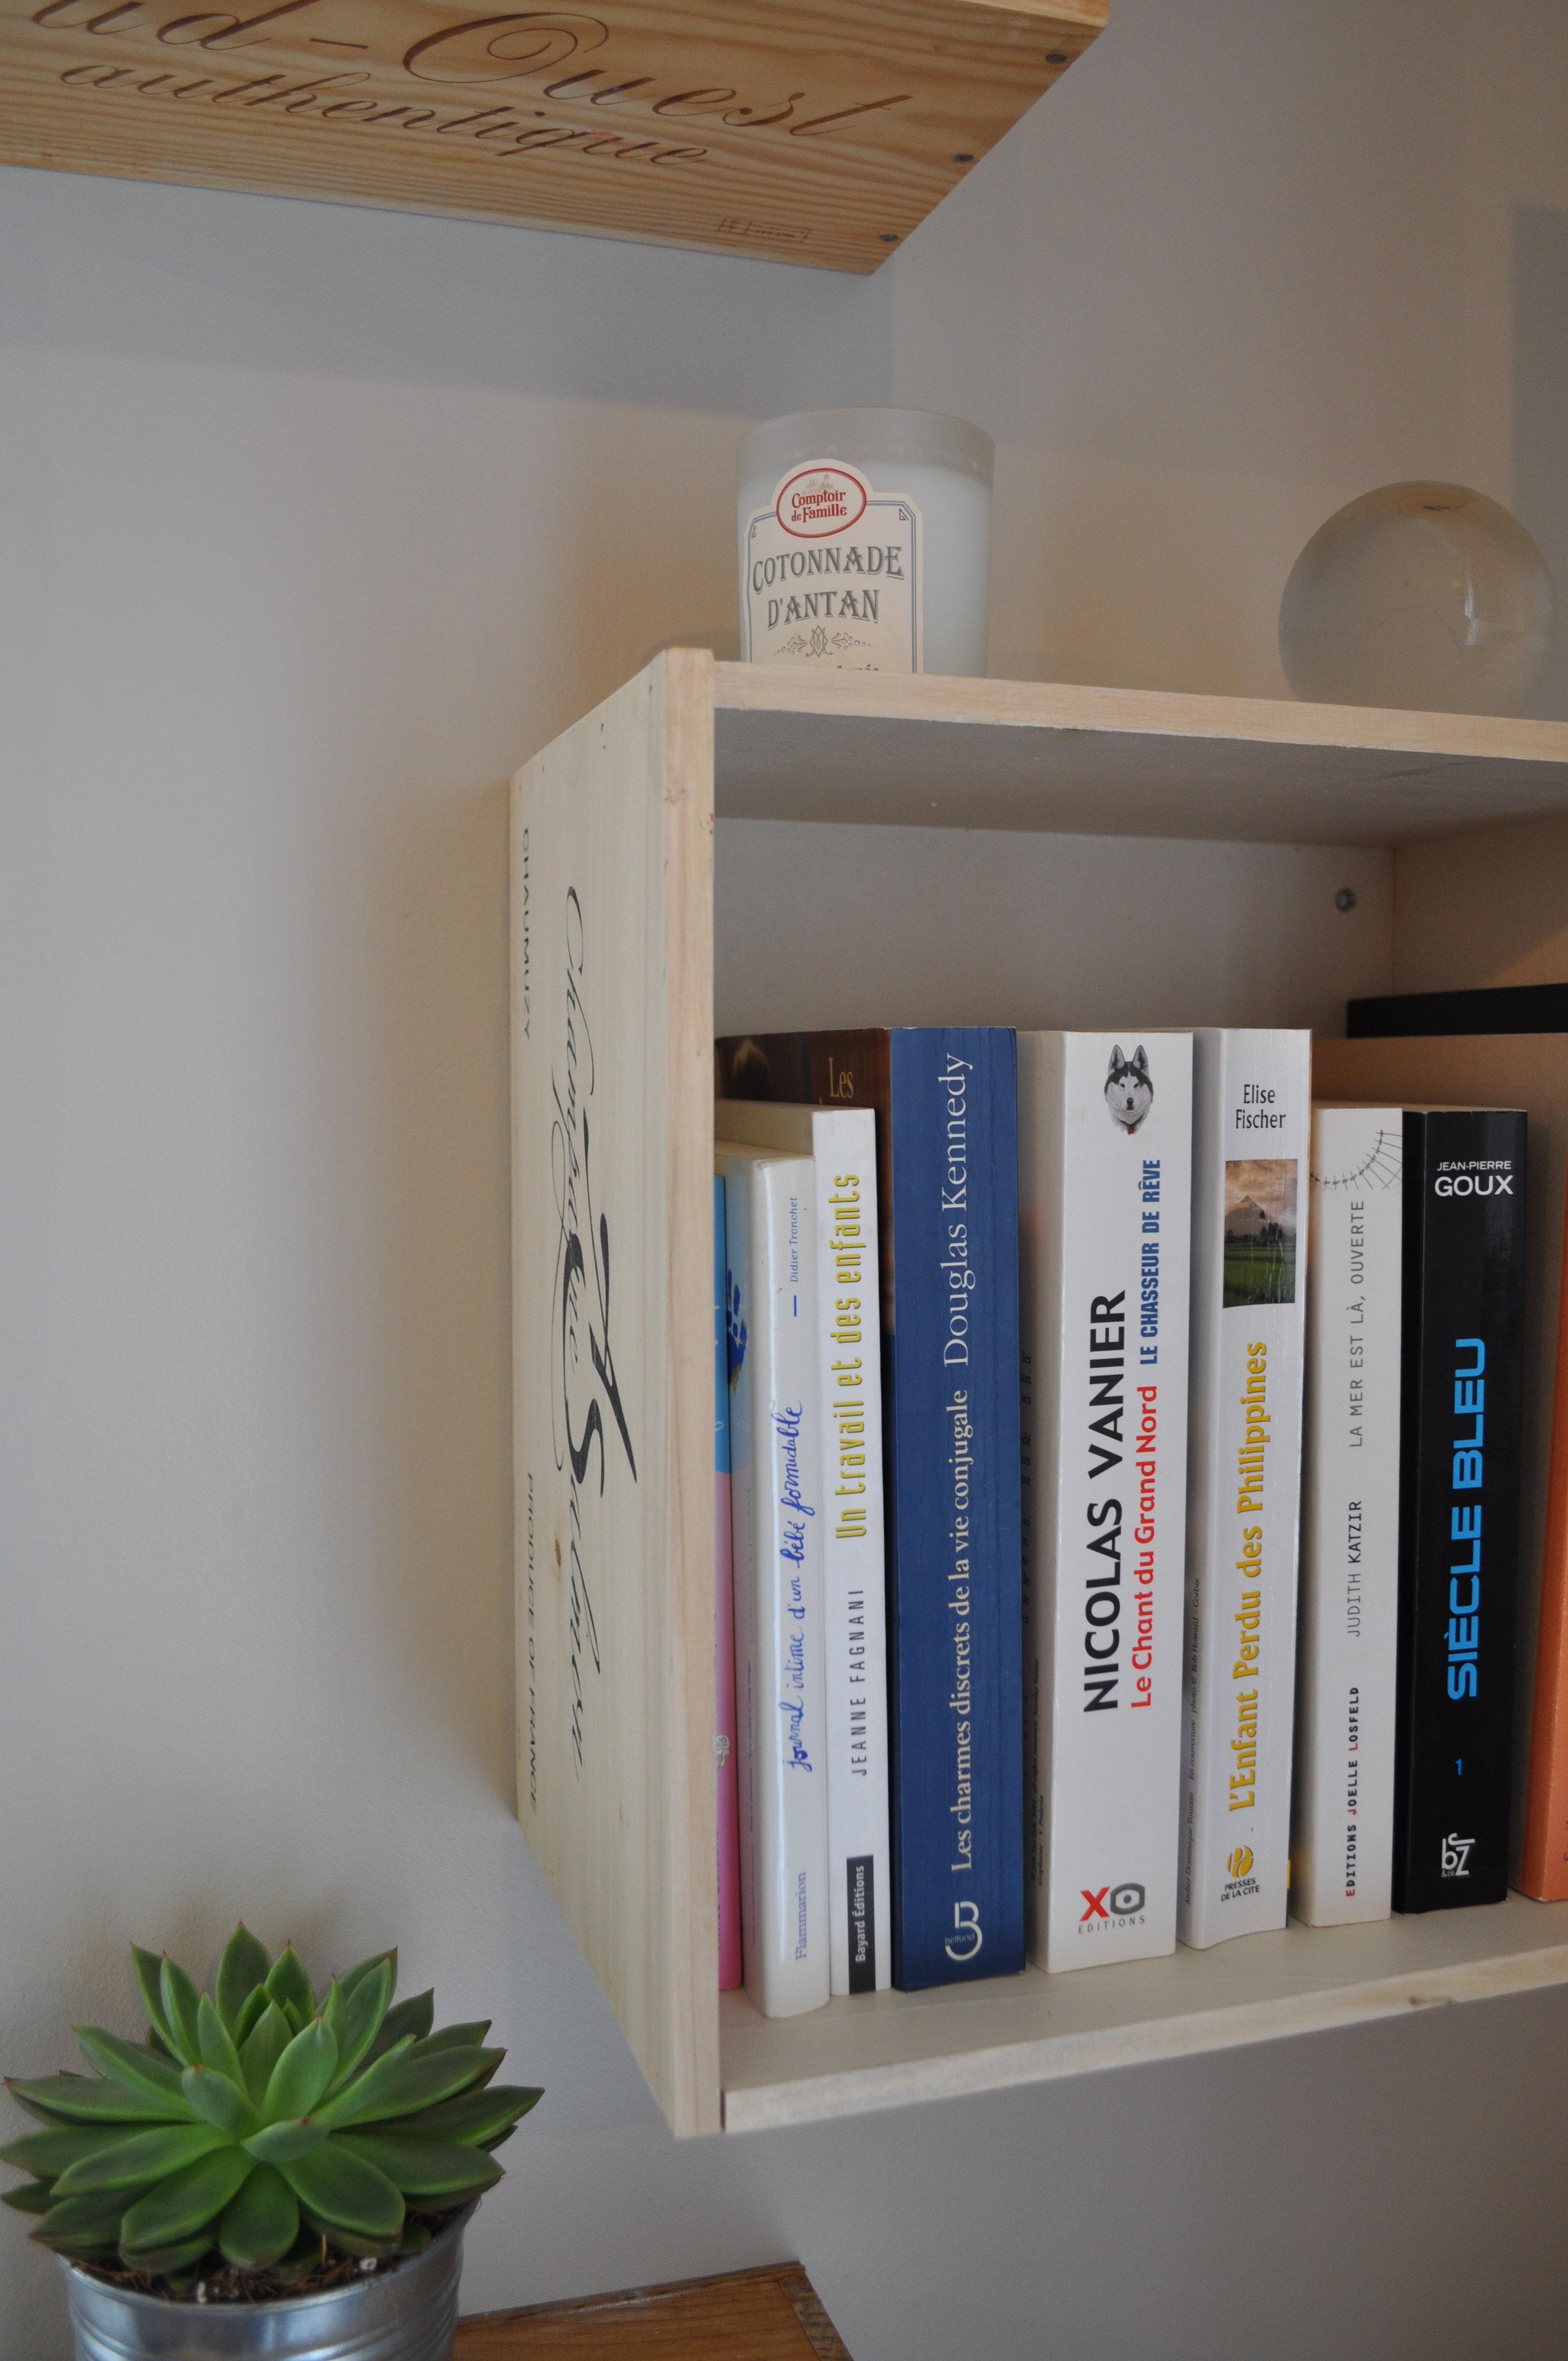 tutoriel diy etag res en caisse de vin. Black Bedroom Furniture Sets. Home Design Ideas